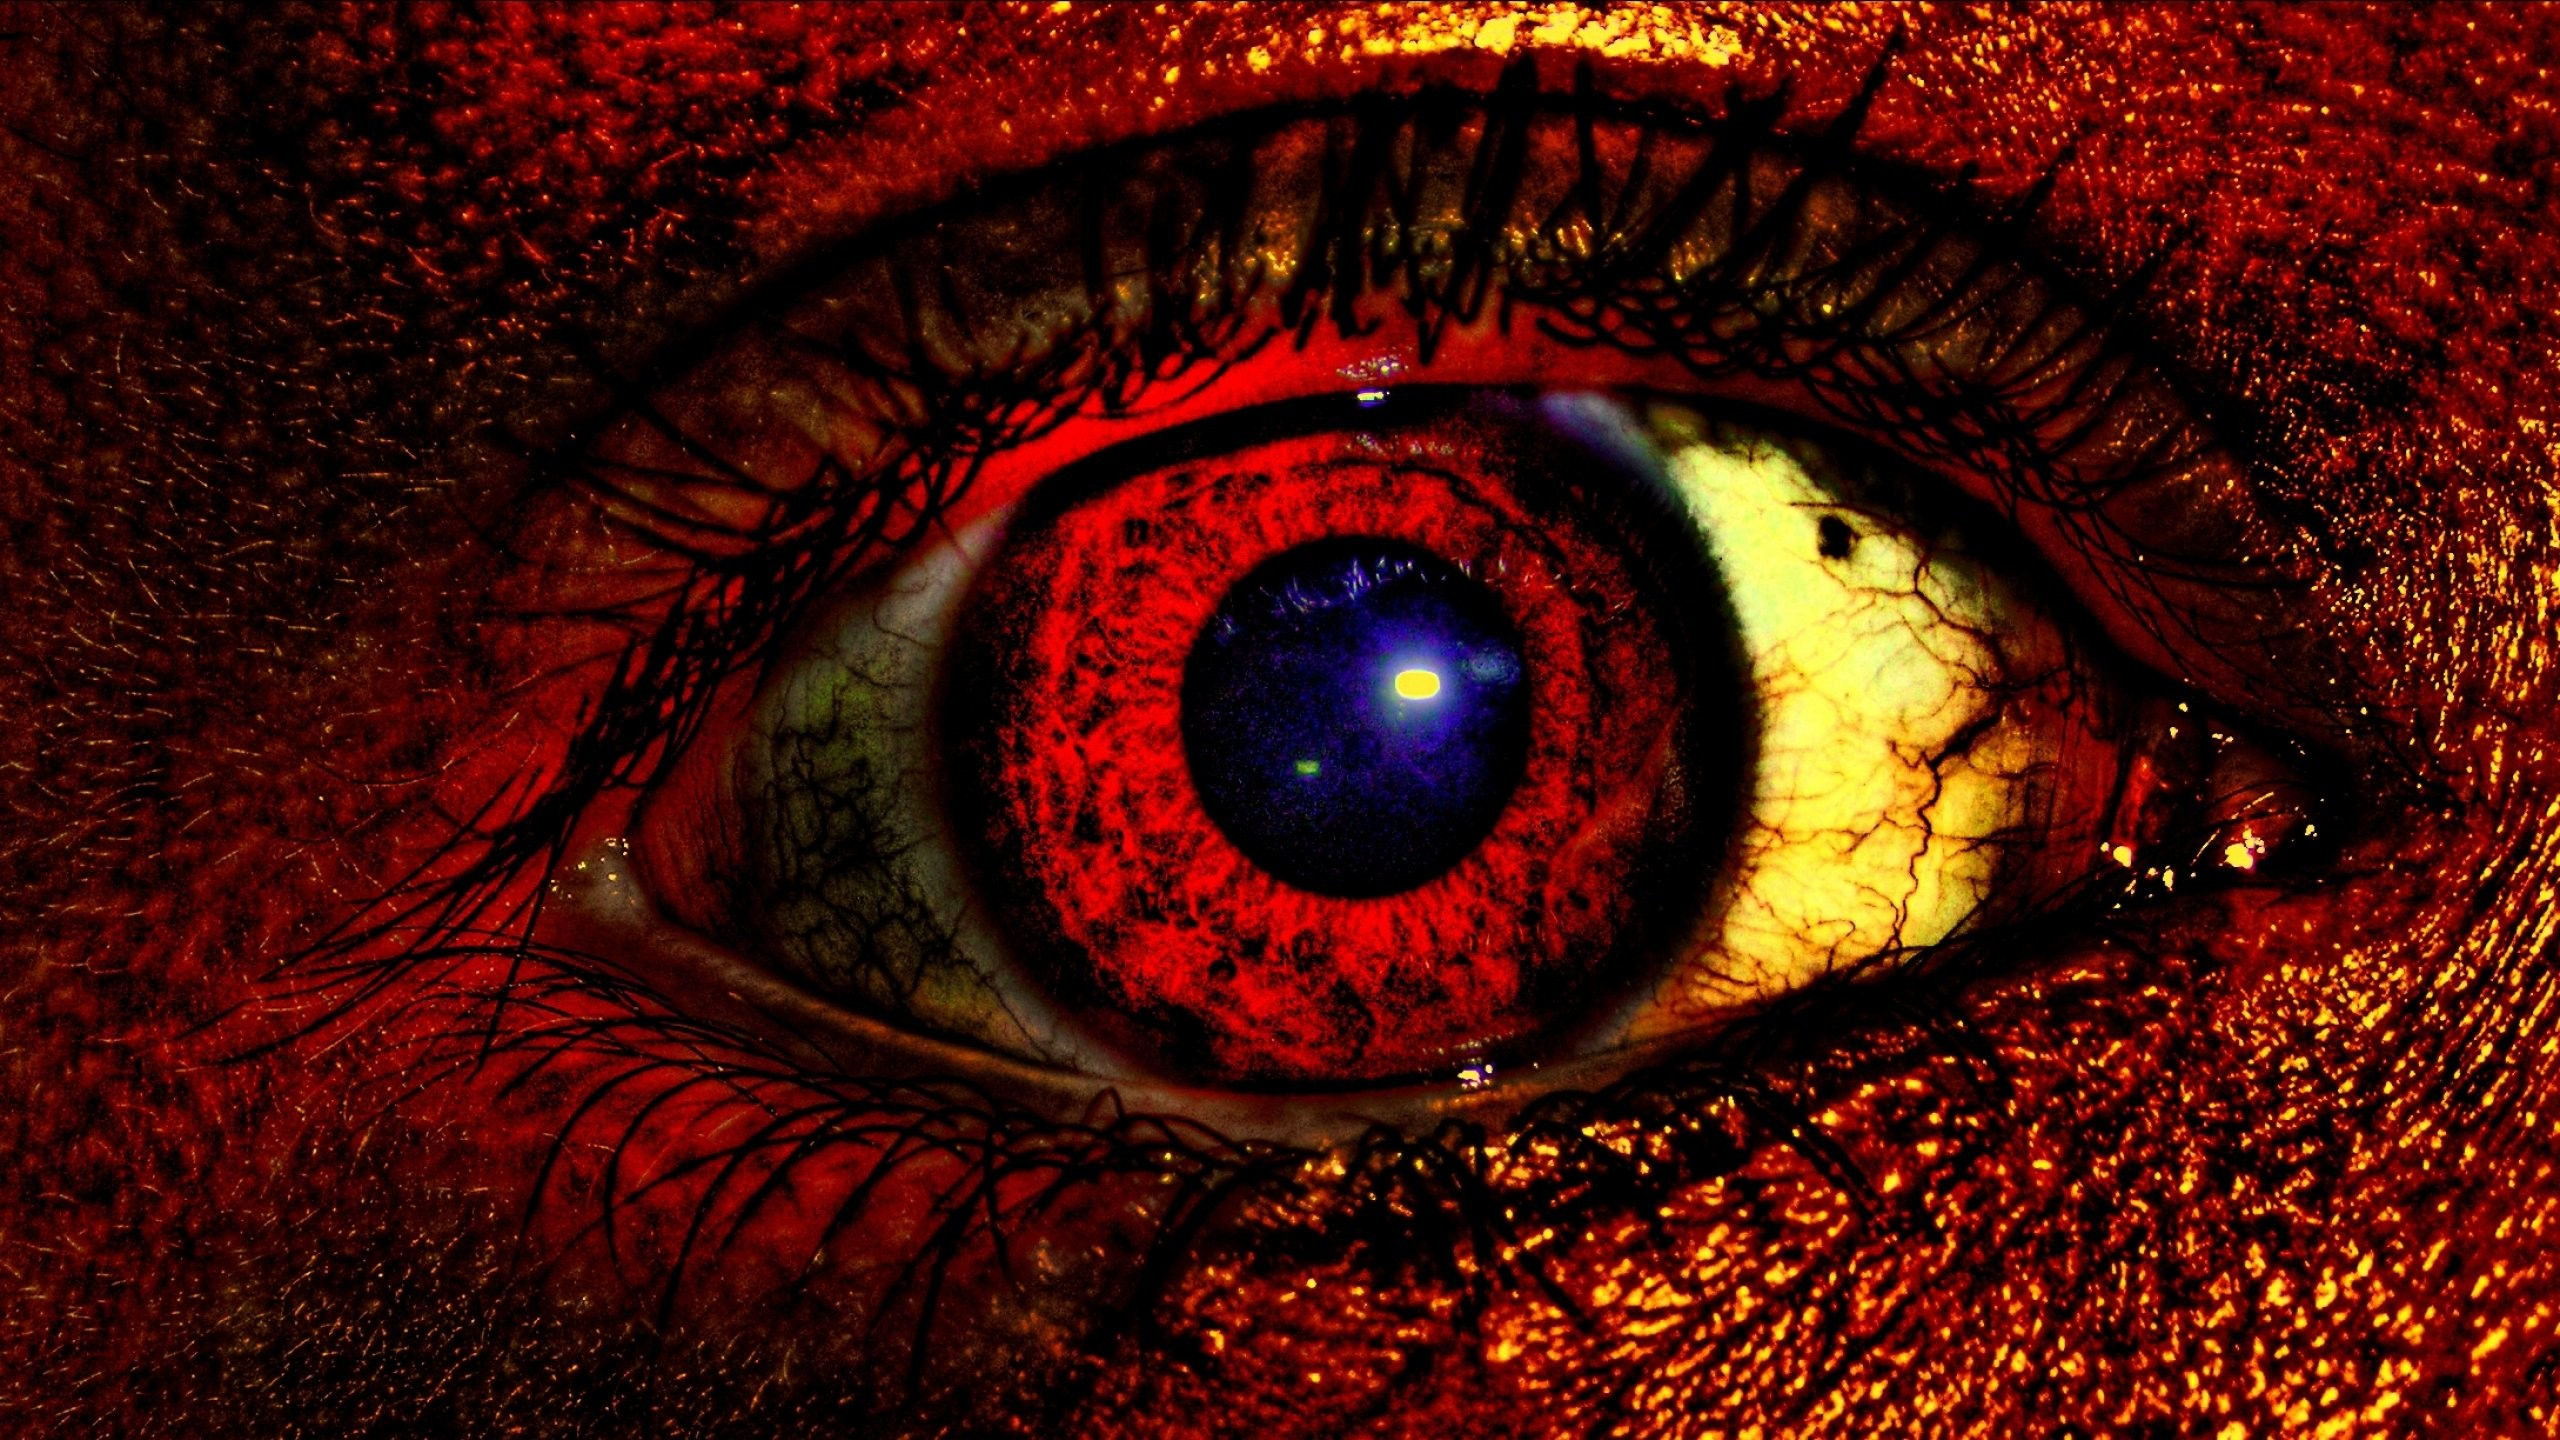 Dark evil occult satanic satan demon eye eyes wallpaper .